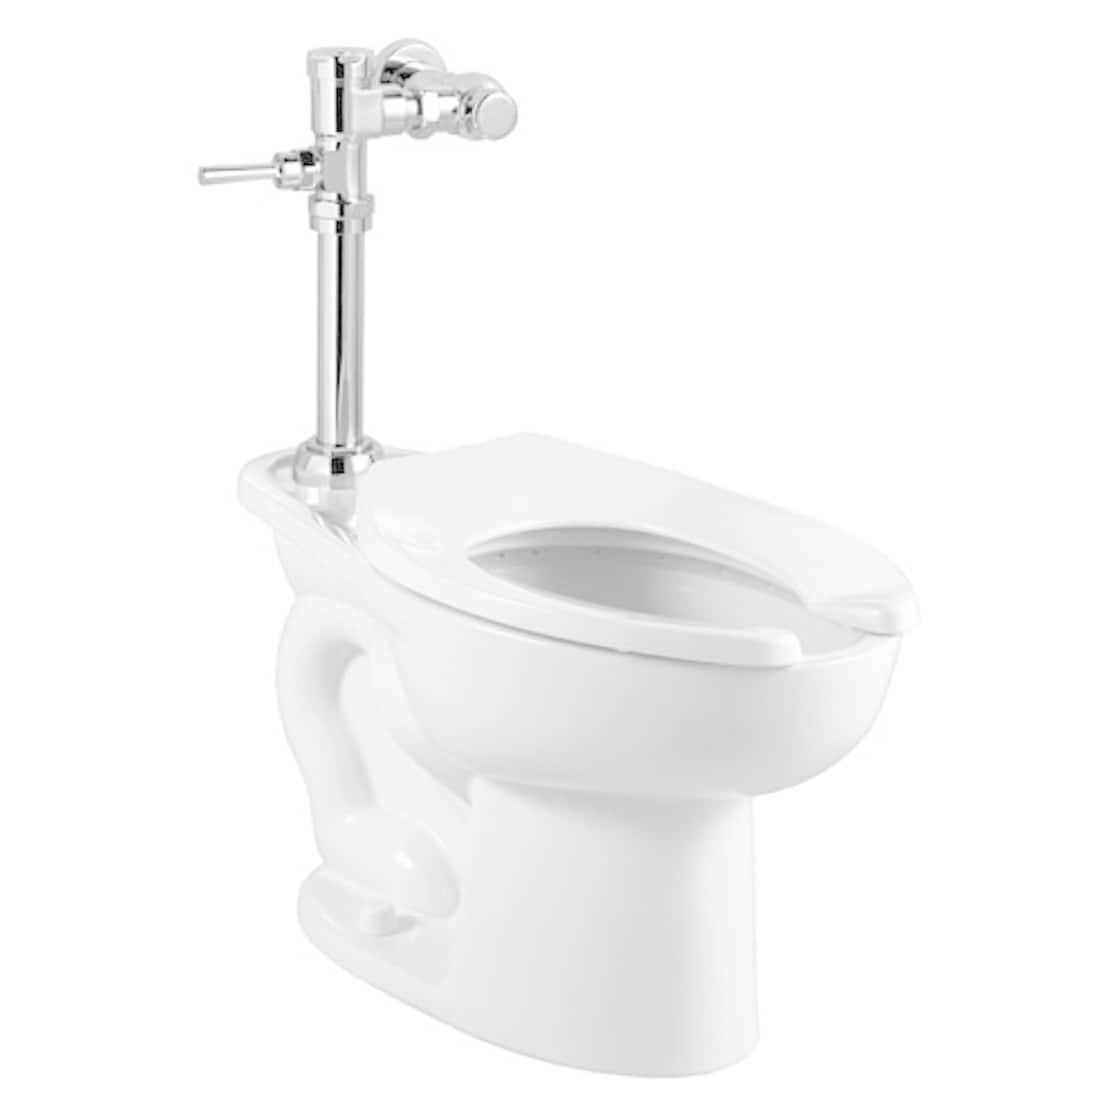 Madera 1.1 GPF Toilet